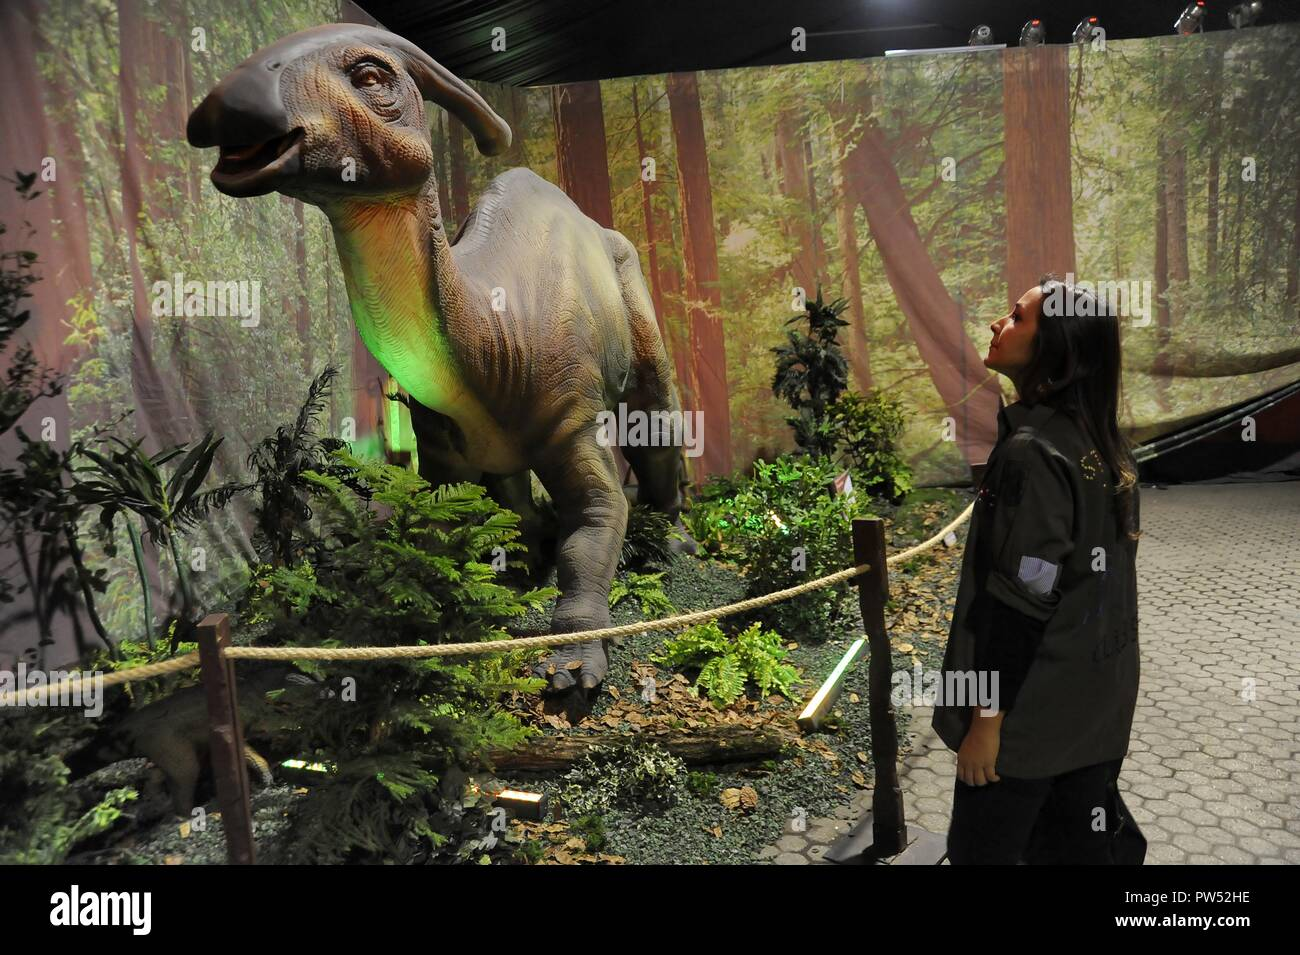 Milan (Italy), exhibition of prehistoric animals reproduced in full size; Parasaurolophus (Parasaurolophus walkeri) - Stock Image